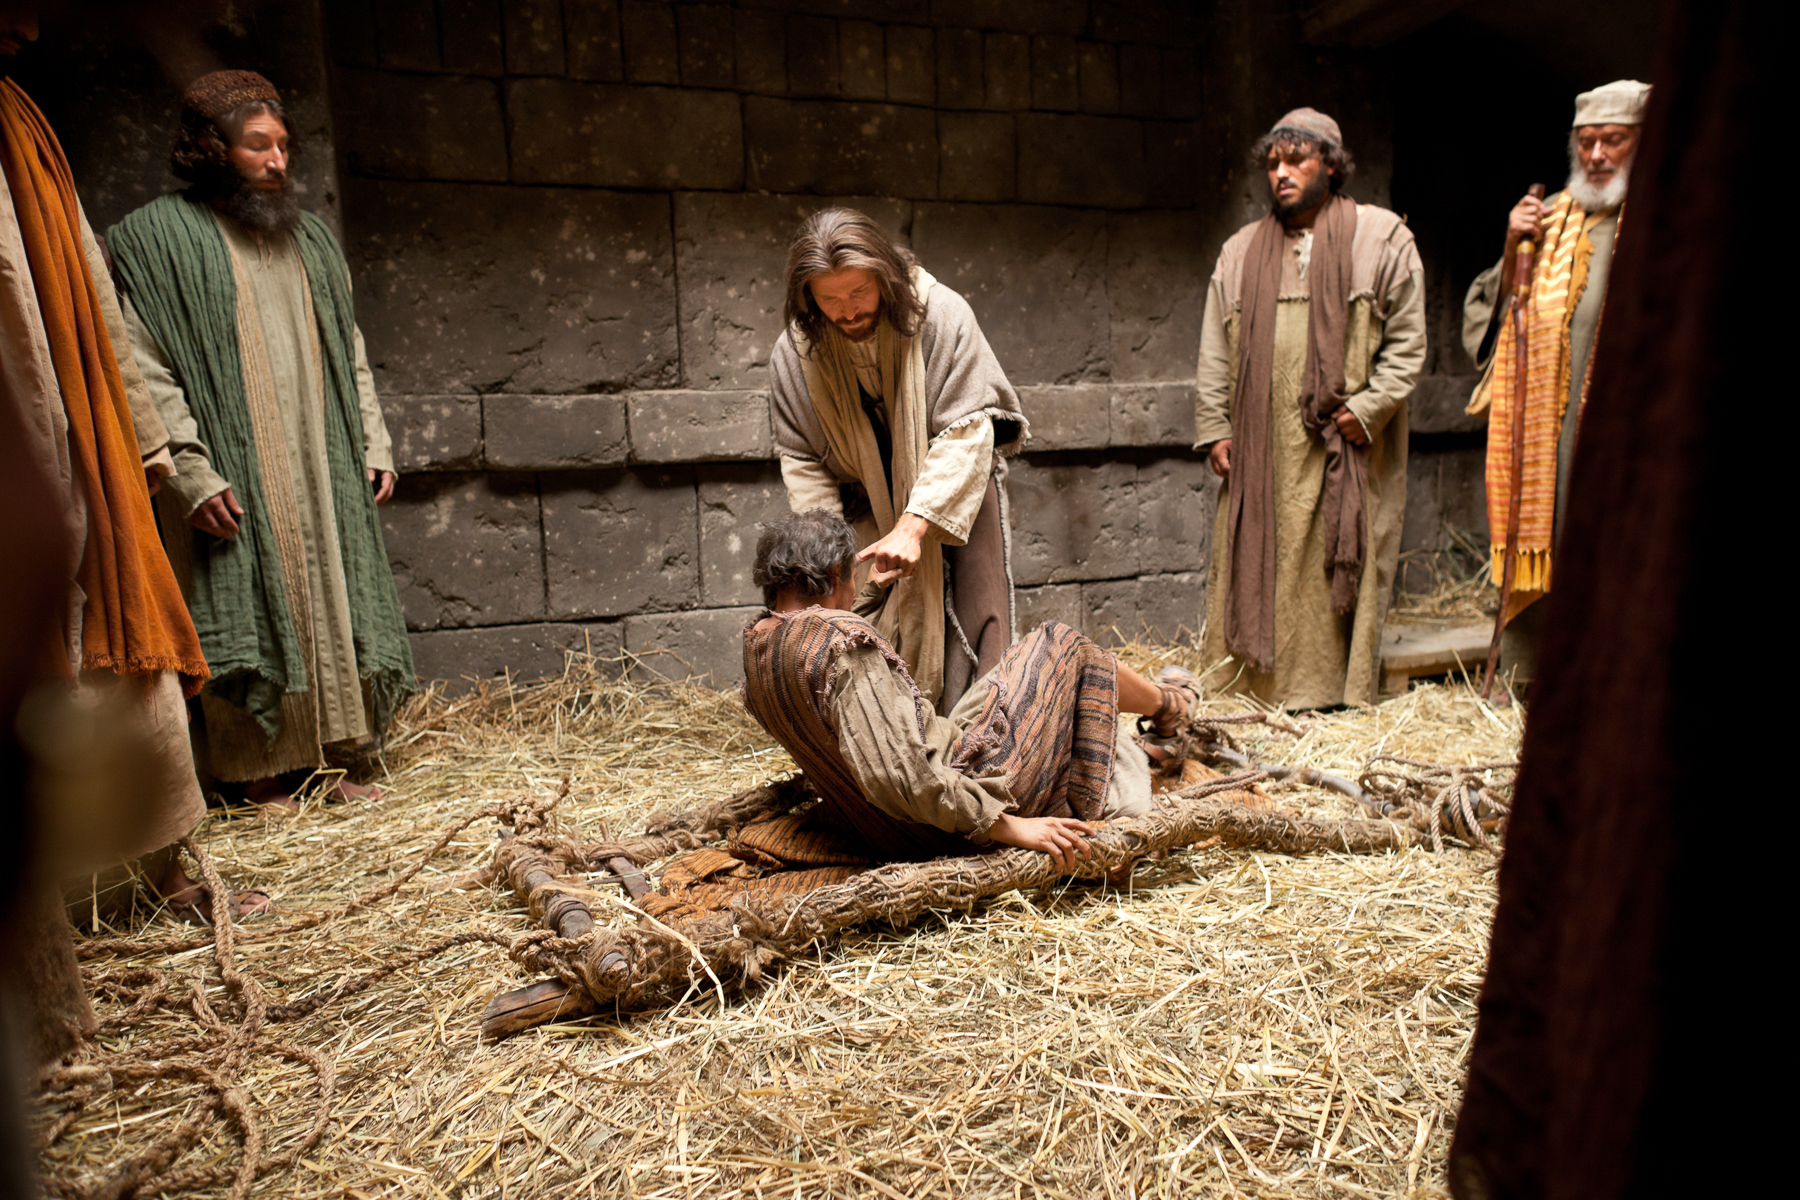 34_jesus-forgives-sins-and-heals-a-man-stricken-with-palsy_1800x1200_300dpi_3